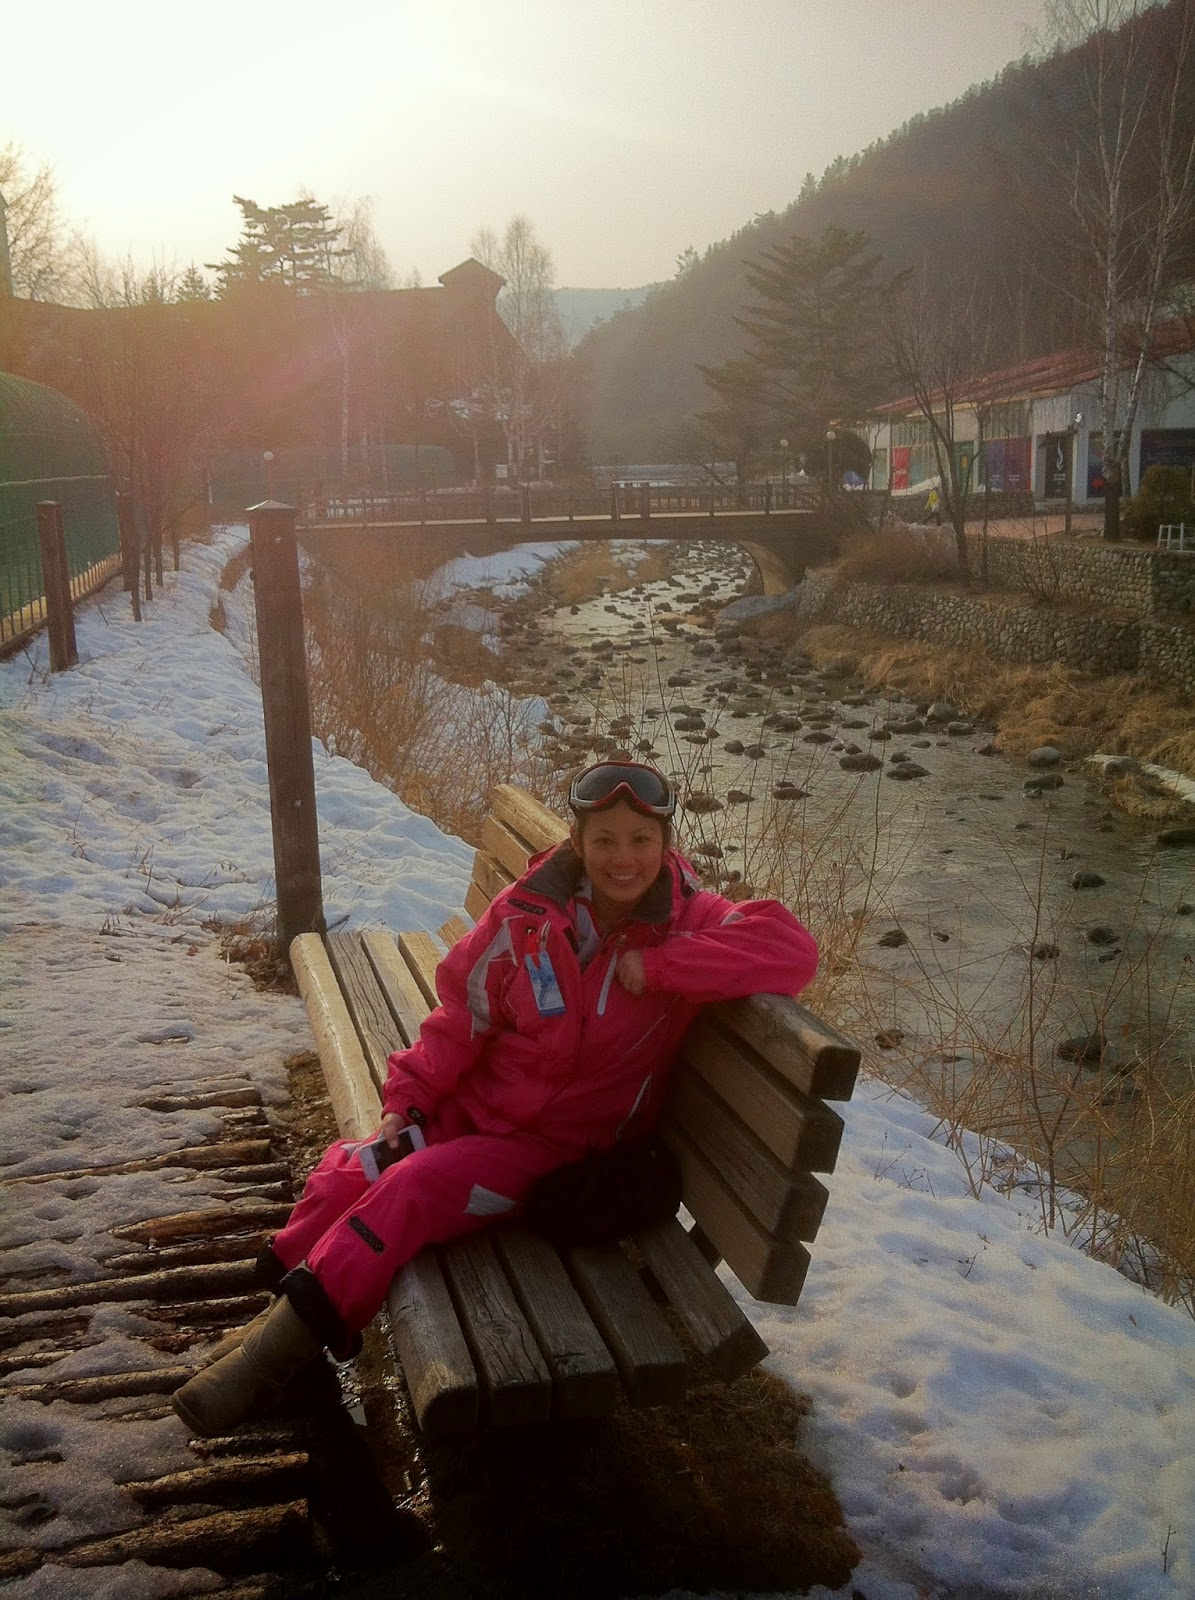 Snowboarding in Yongpyong, South Korea 2013 (kennethstephanie.com)